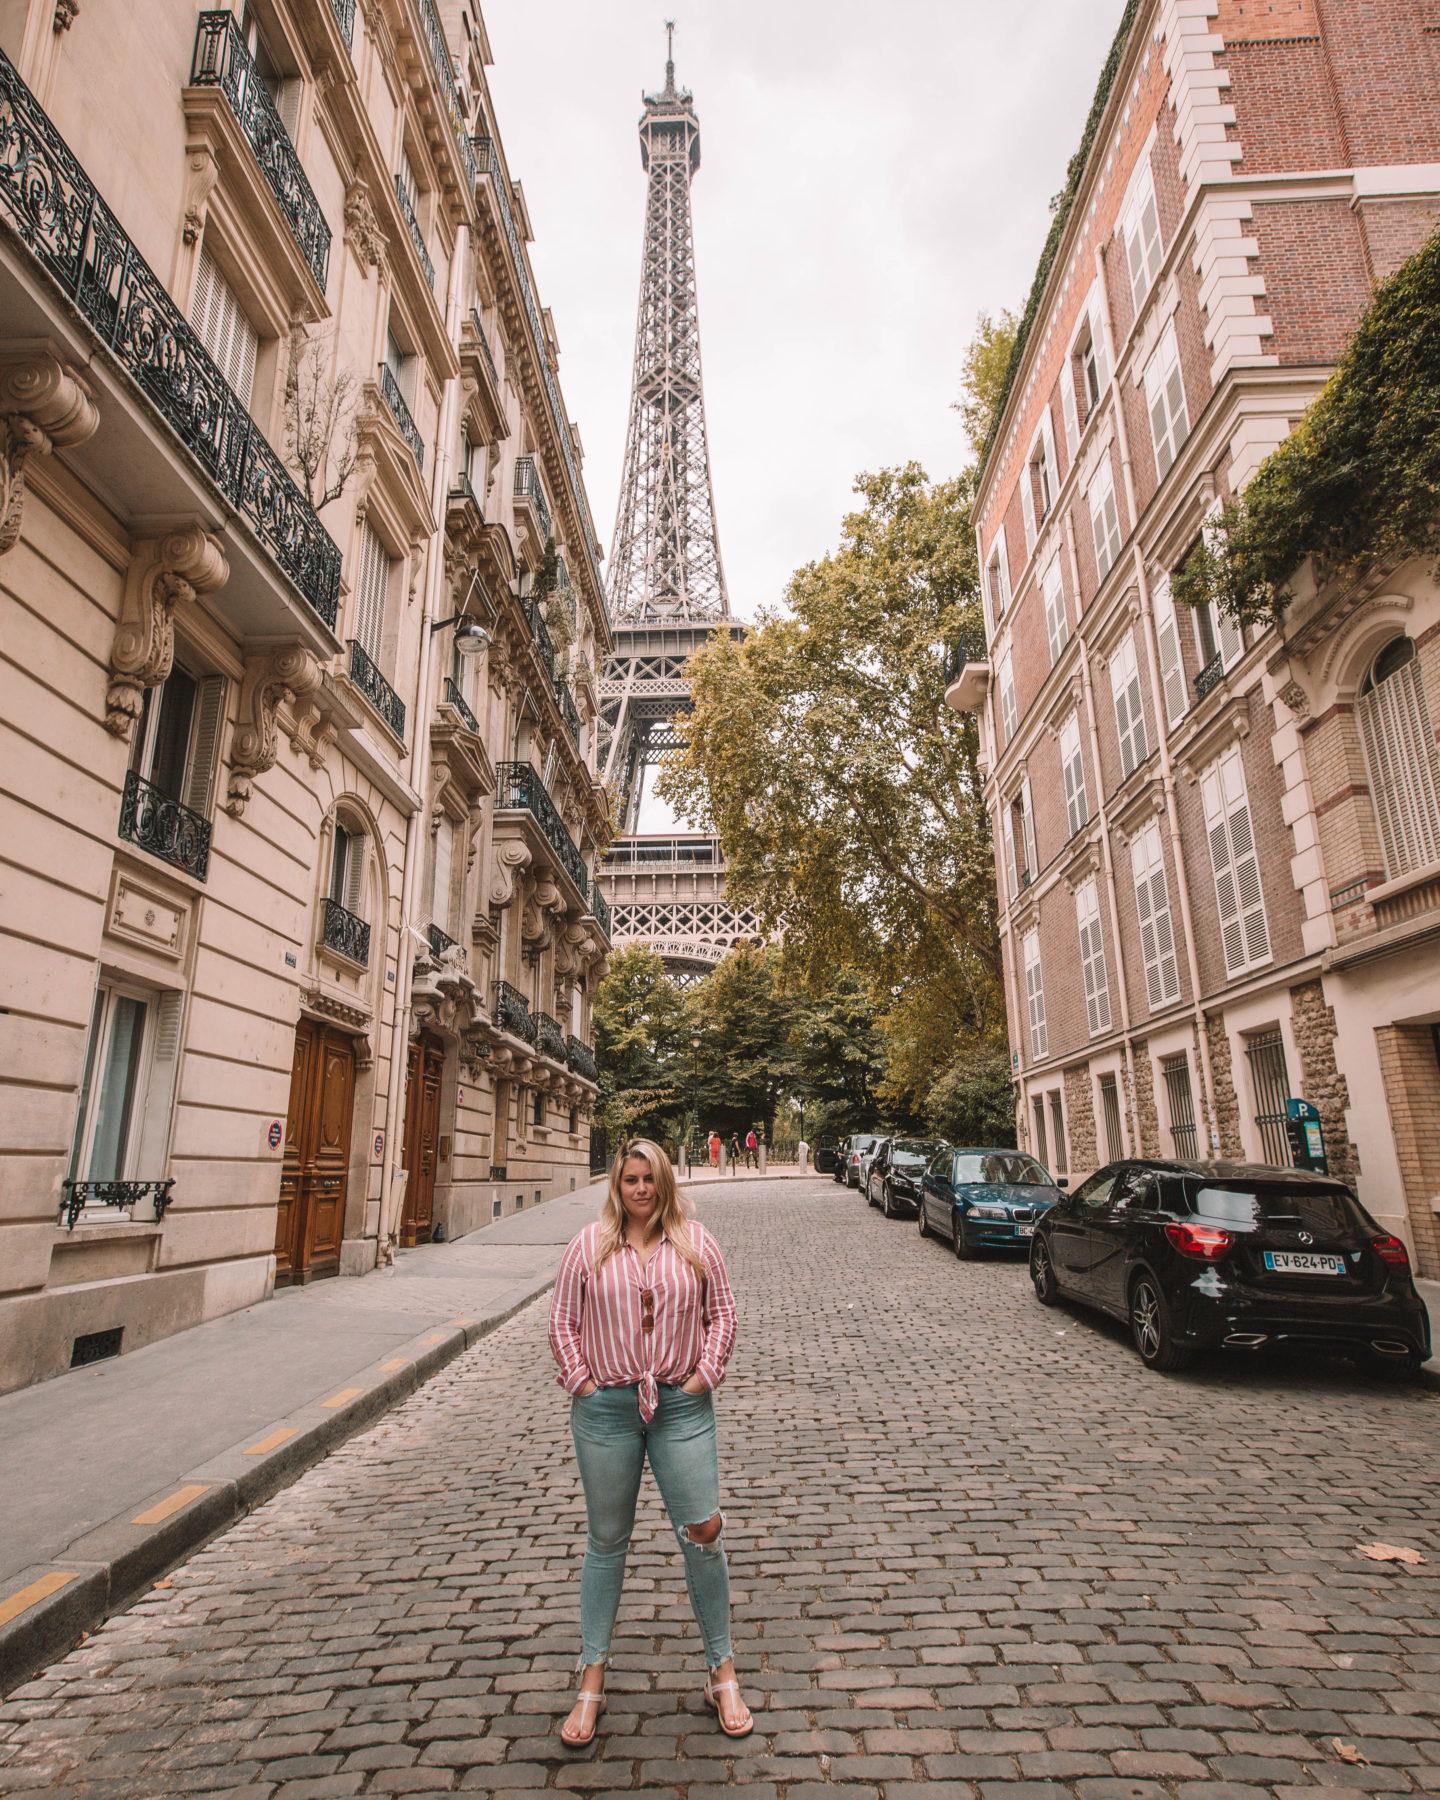 woman standing on cobblestone street in neighborhood overlooking the eiffel tower in paris france